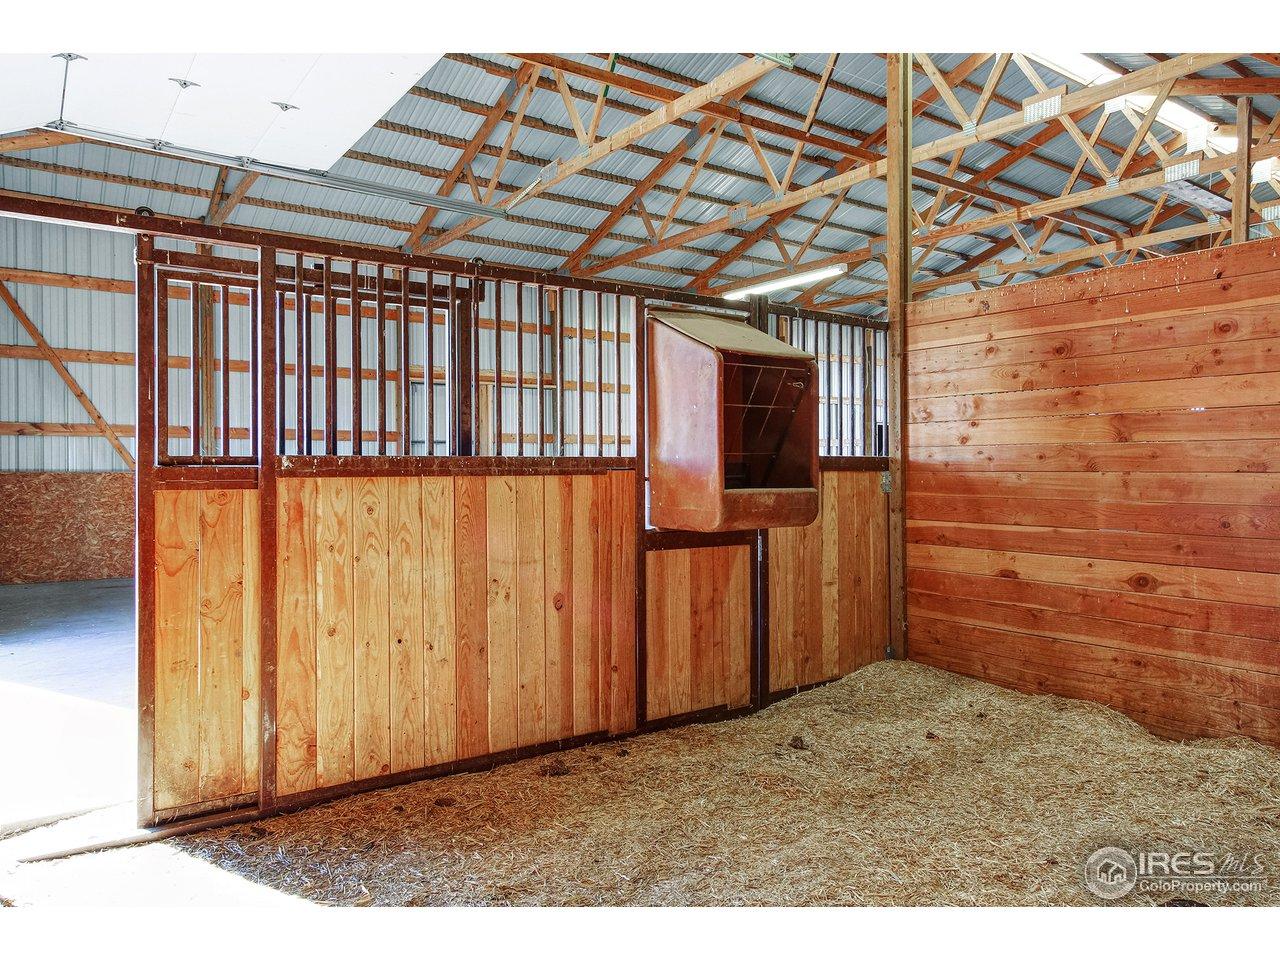 3 Horse Stalls